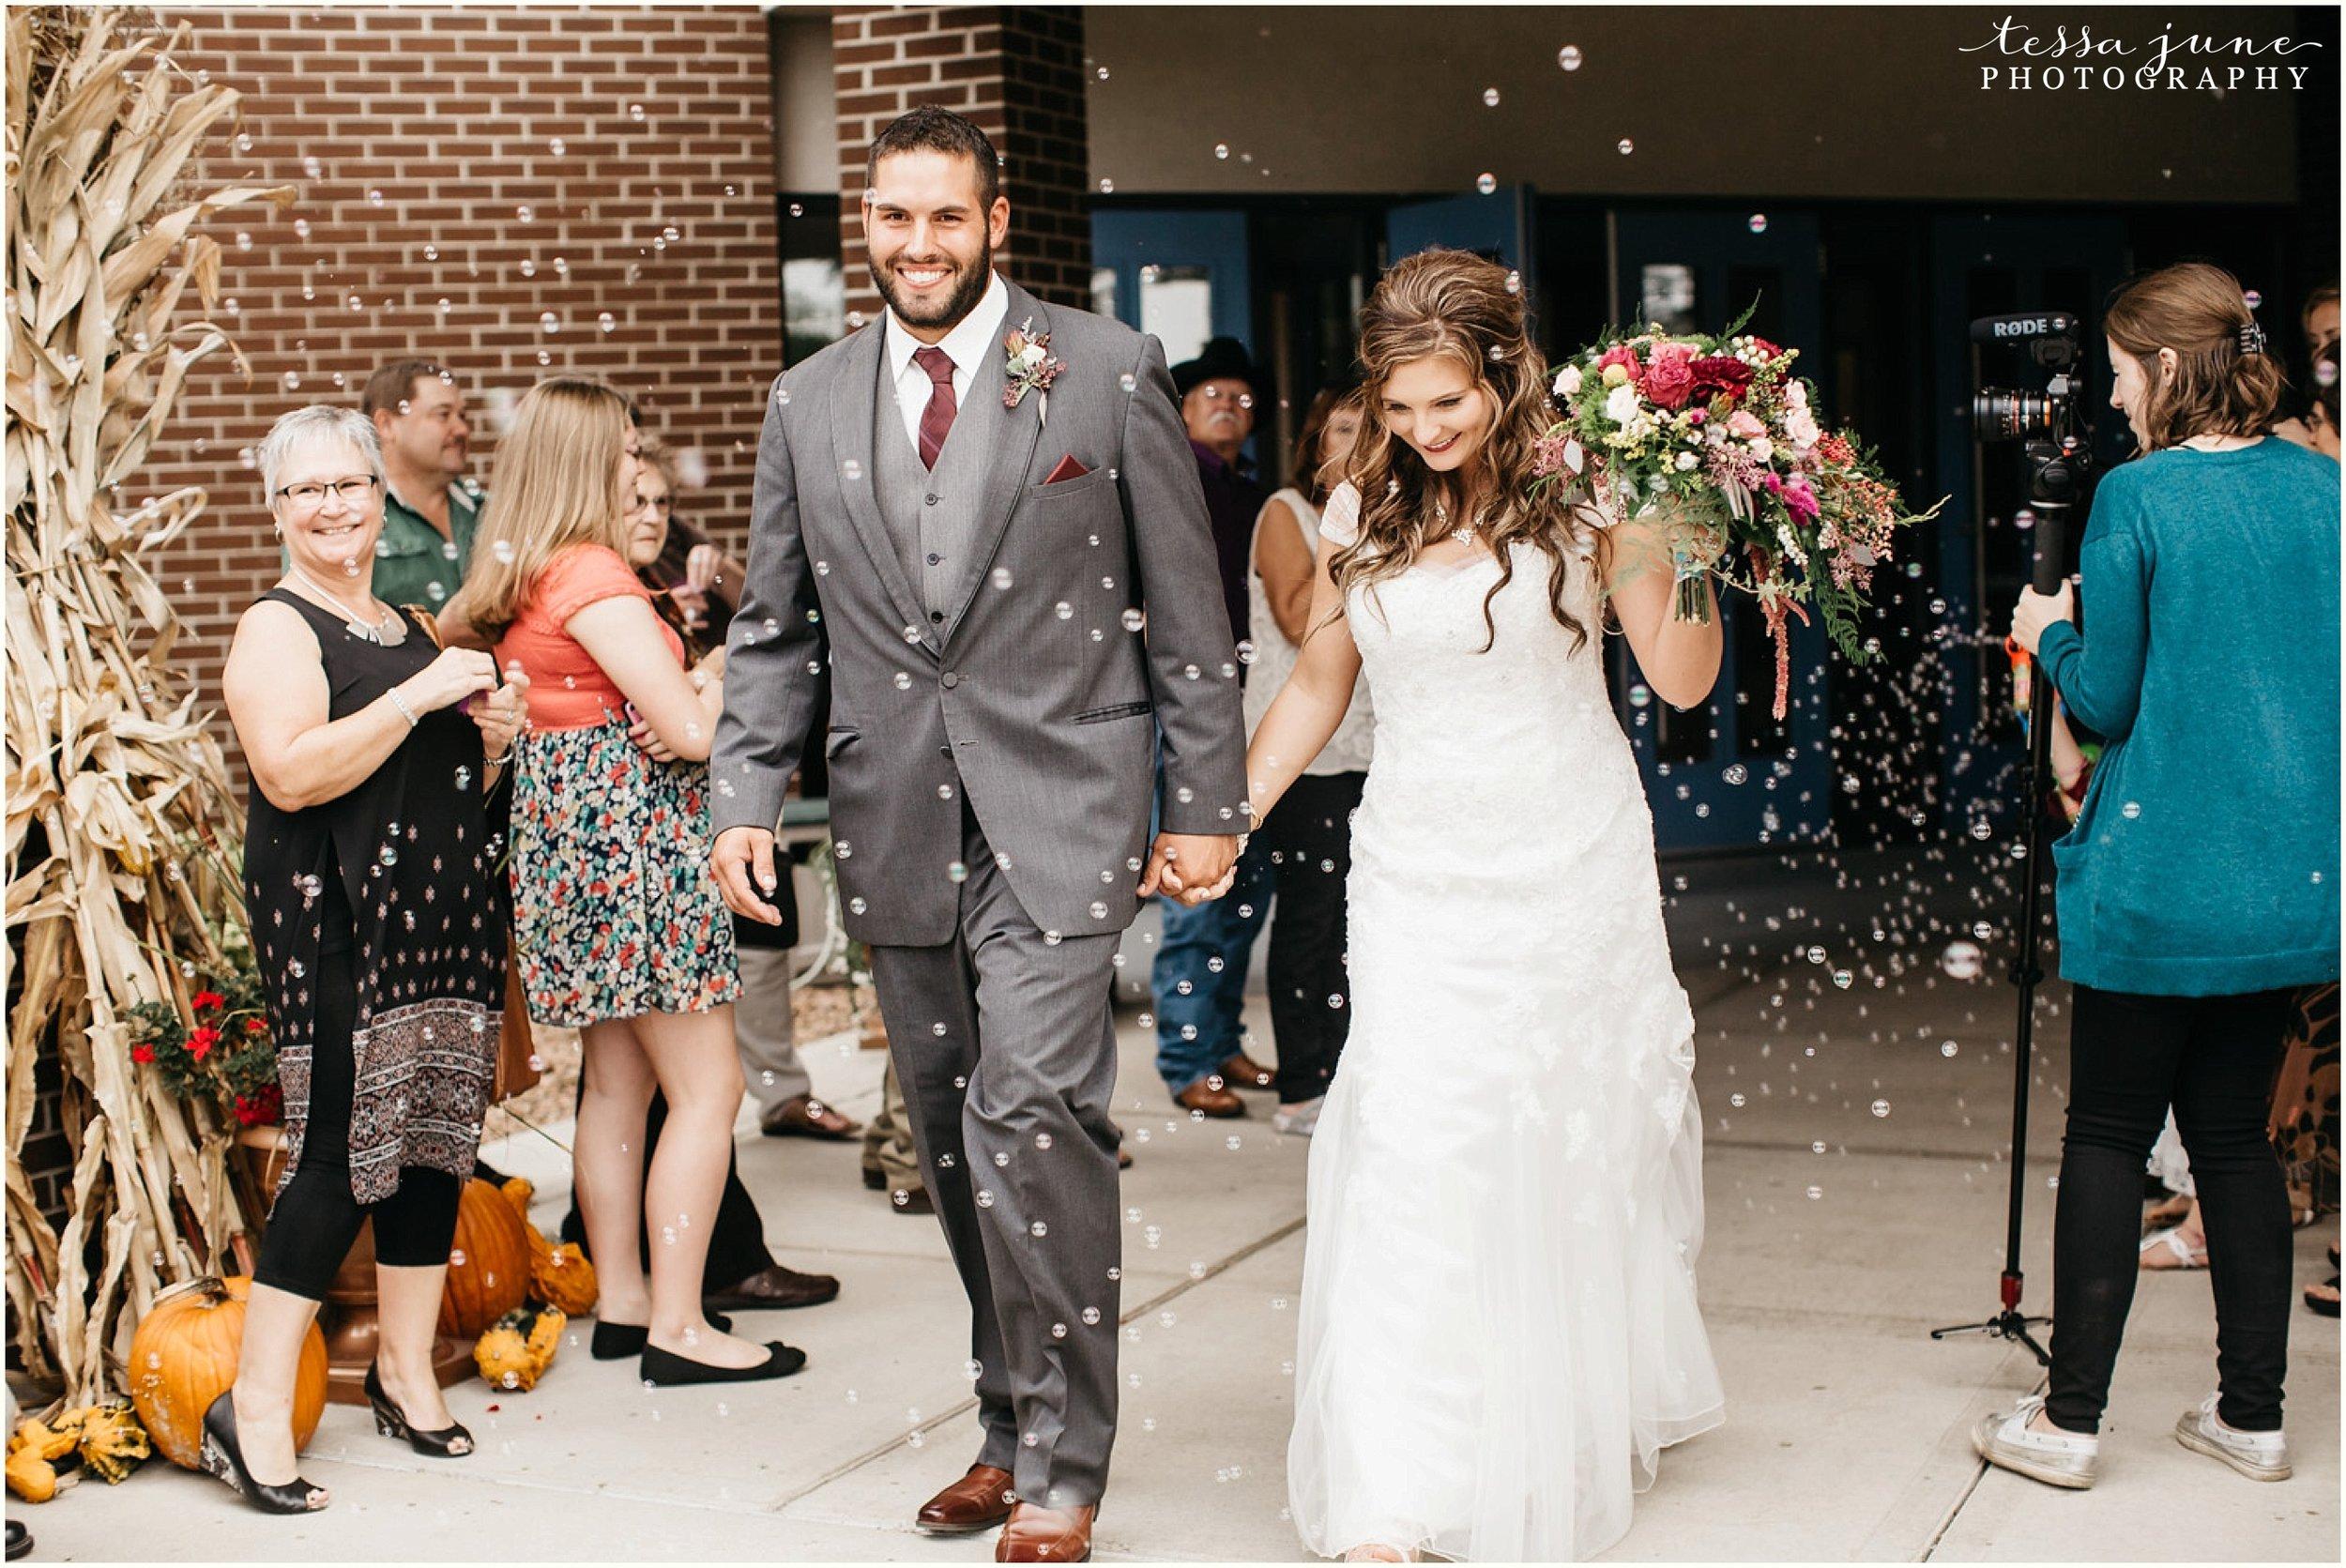 bohemian-minnesota-wedding-mismatched-bridesmaid-dresses-waterfall-st-cloud-tessa-june-photography-120.jpg